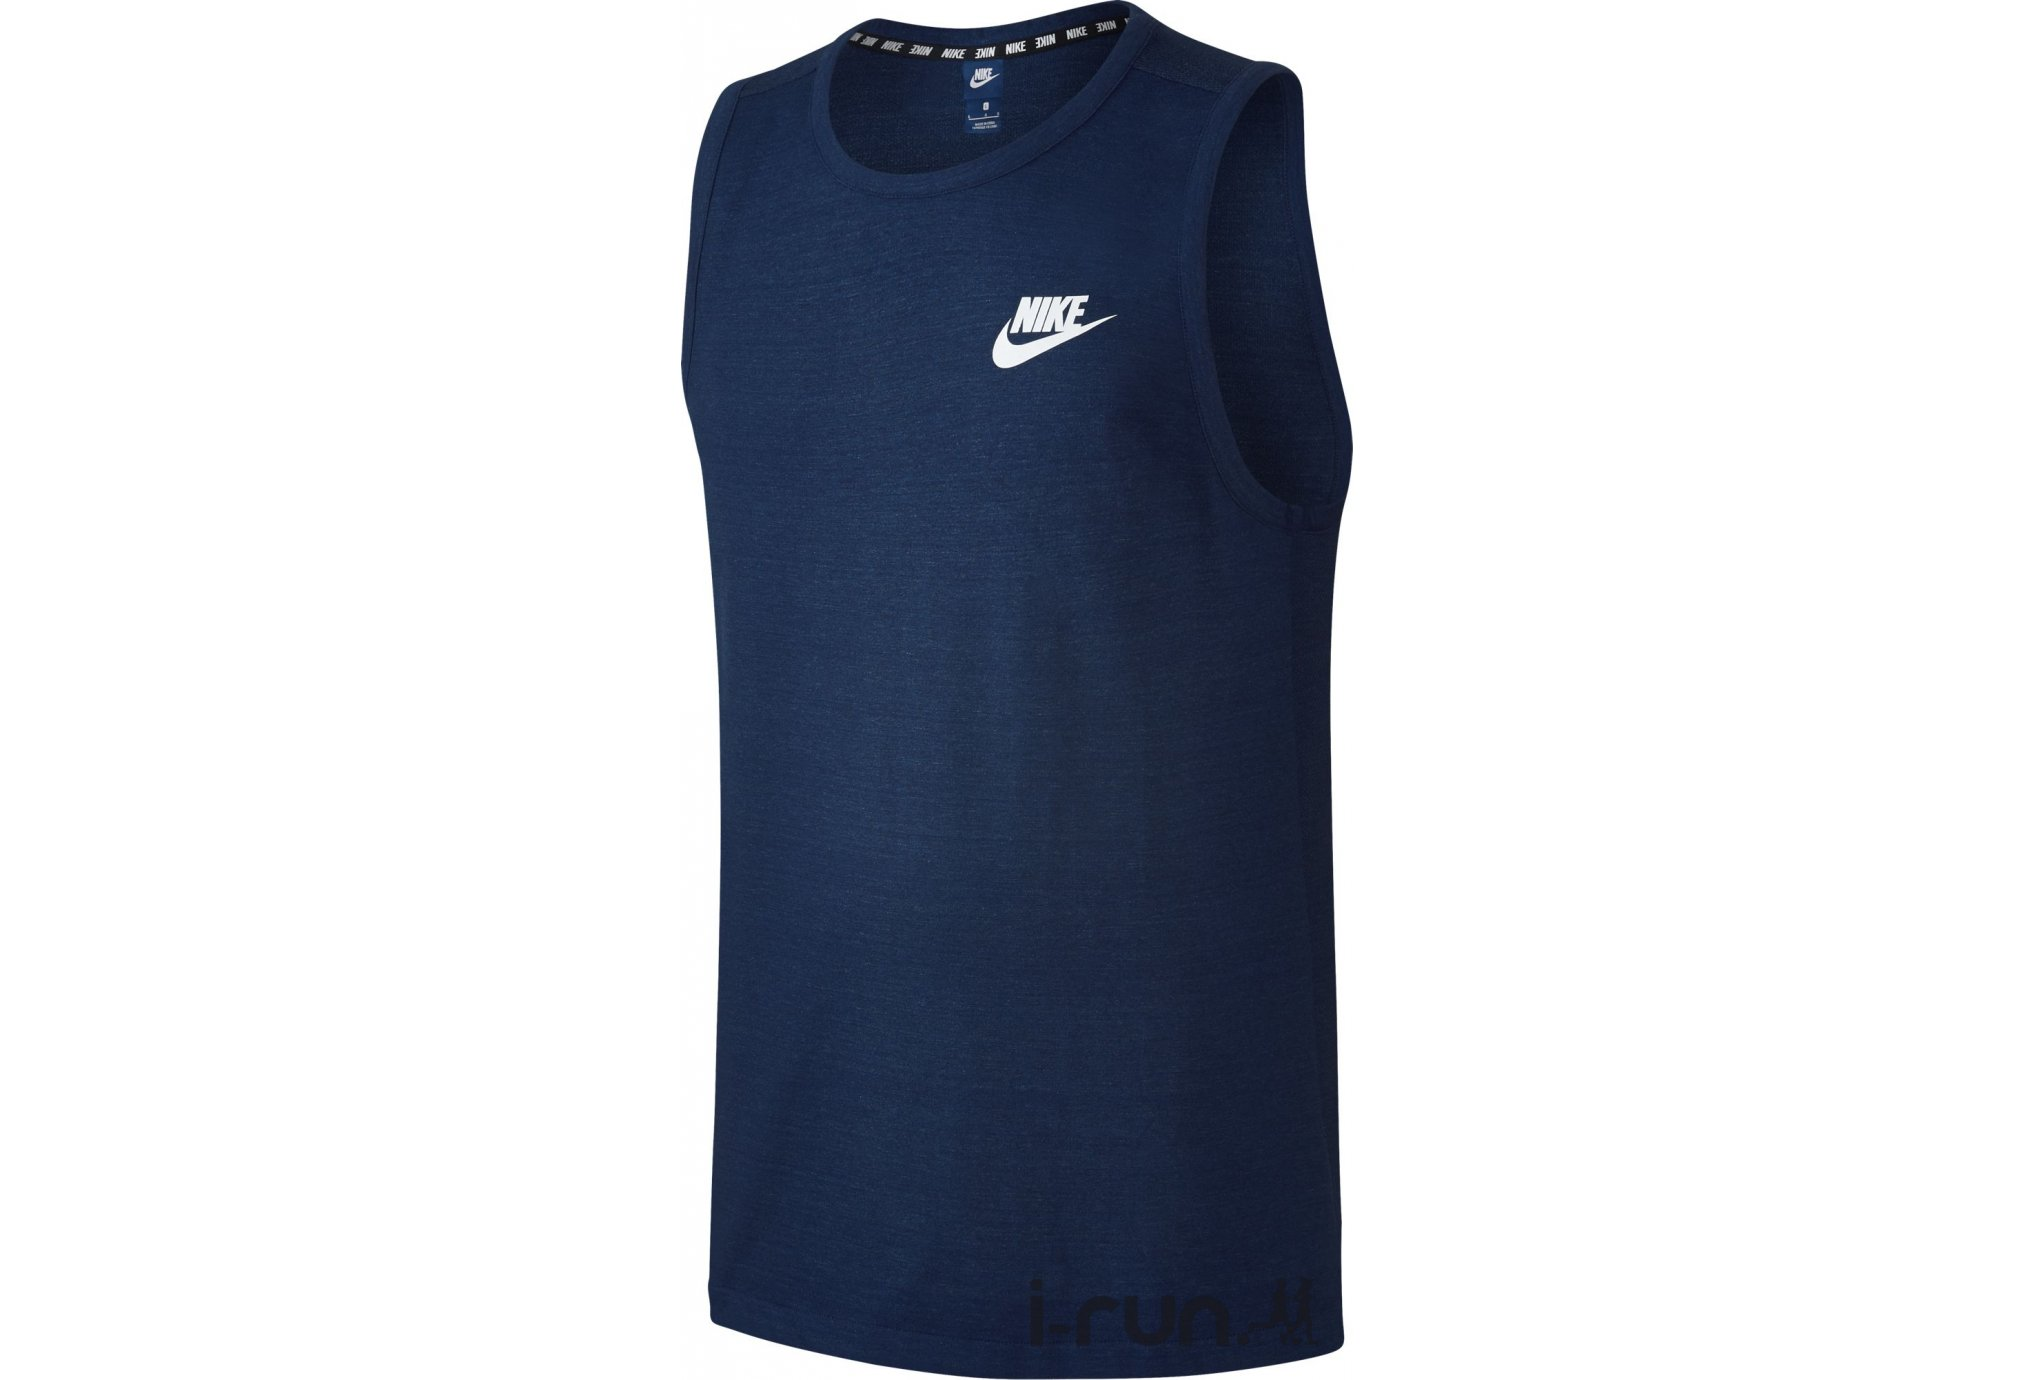 Nike Advance 15 M vêtement running homme